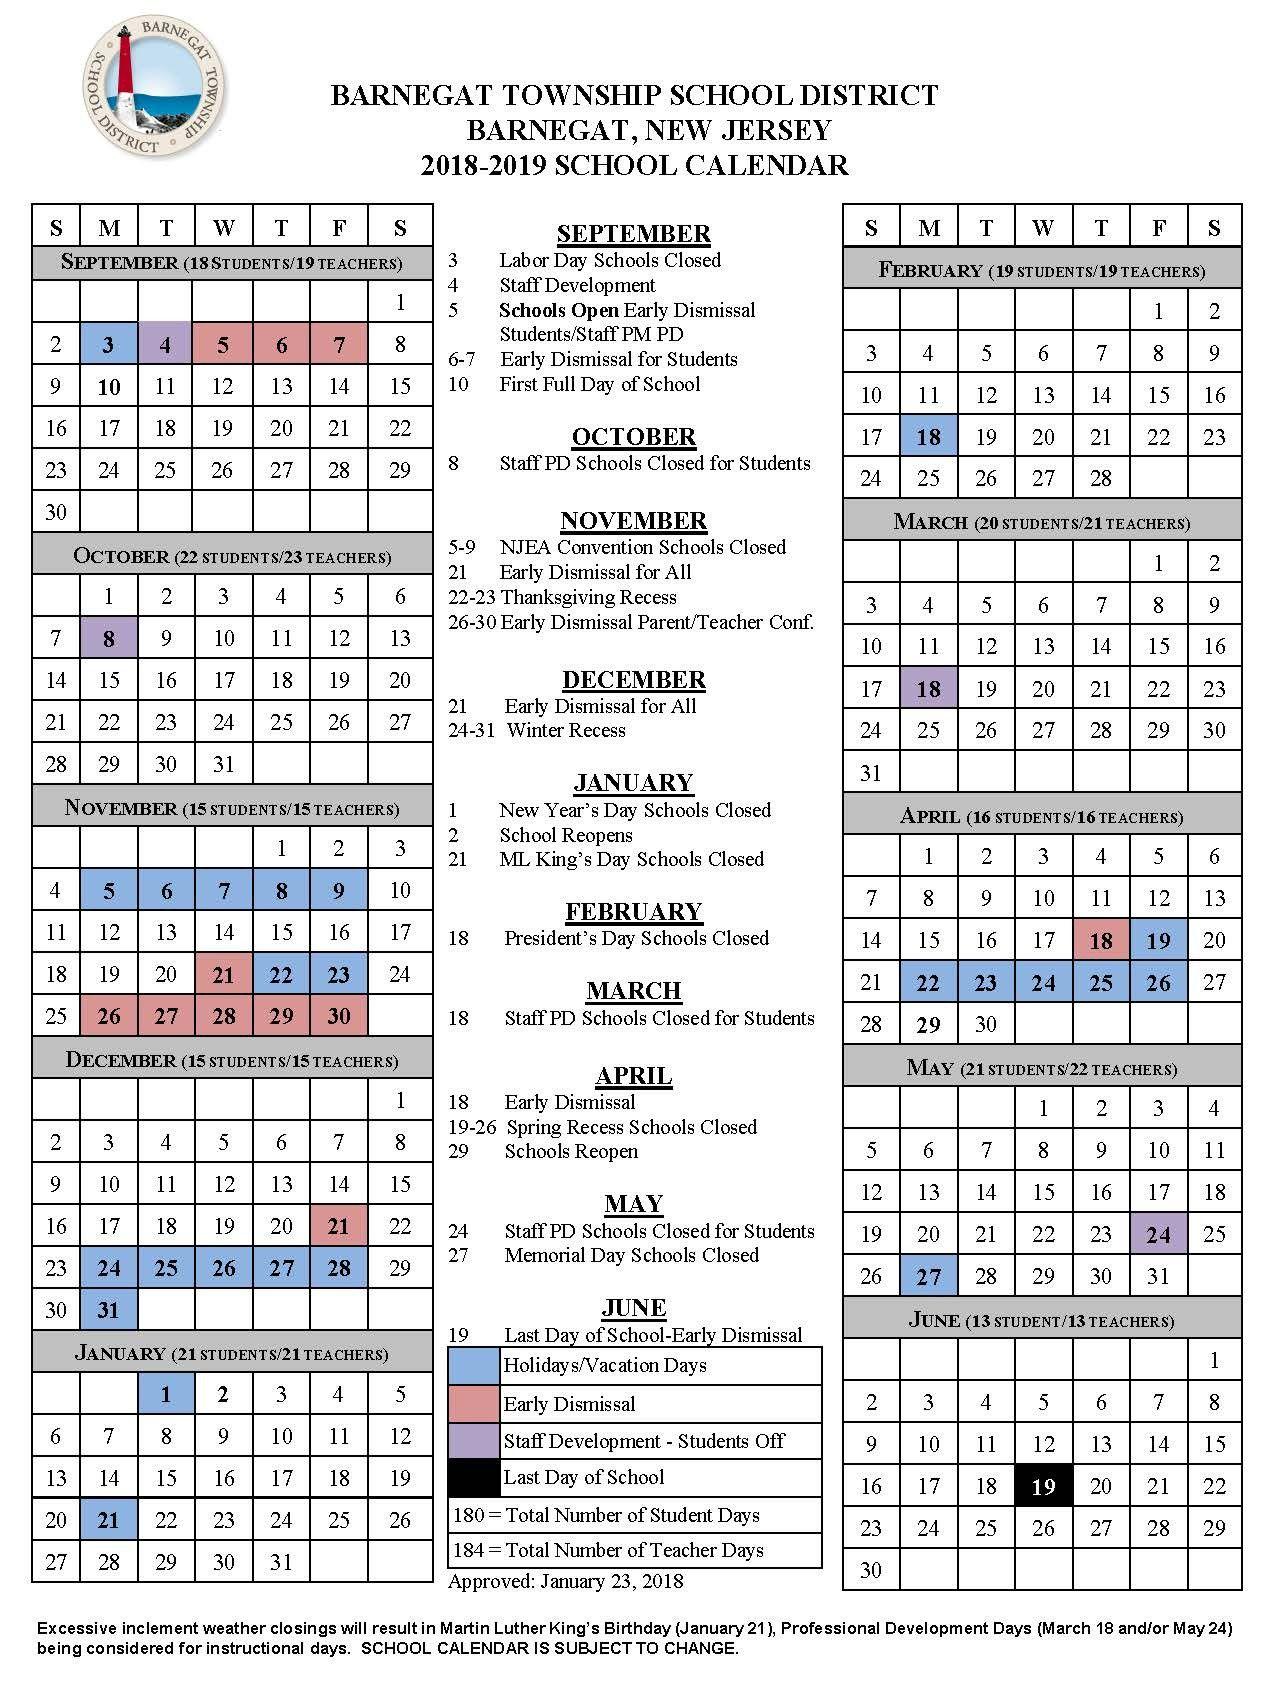 50 broward county school calendar 2018 2019 ja4u di 2020